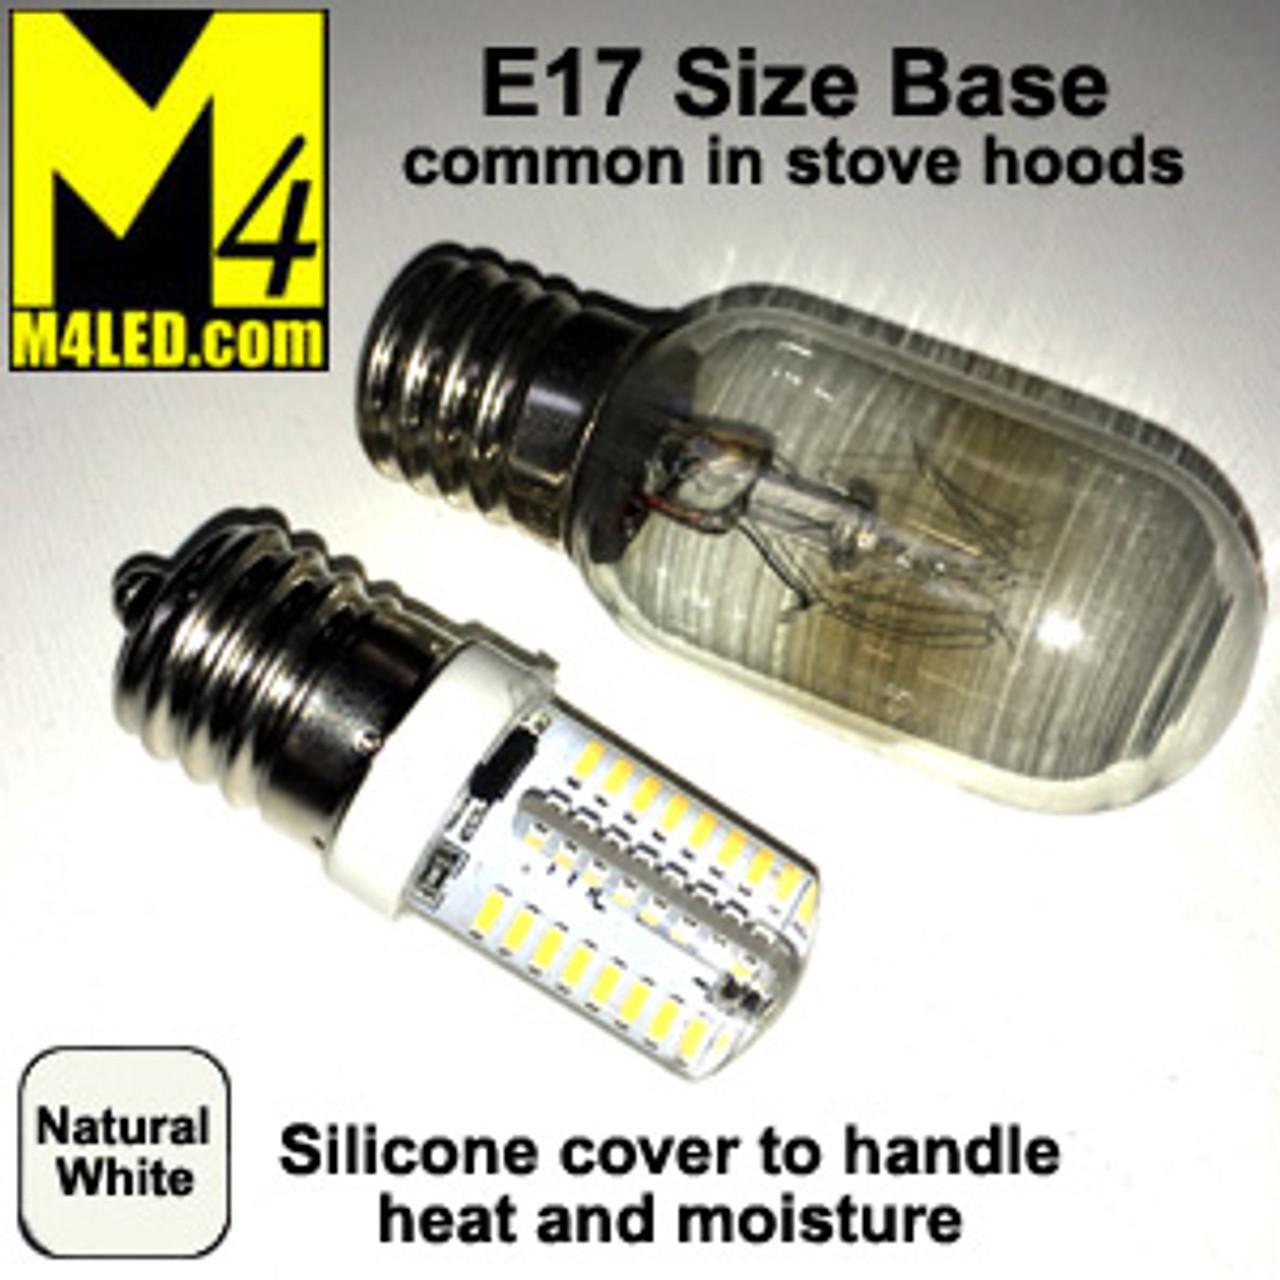 T25-SIL-NW Natural White 110/120v T25 LED with E17 Base